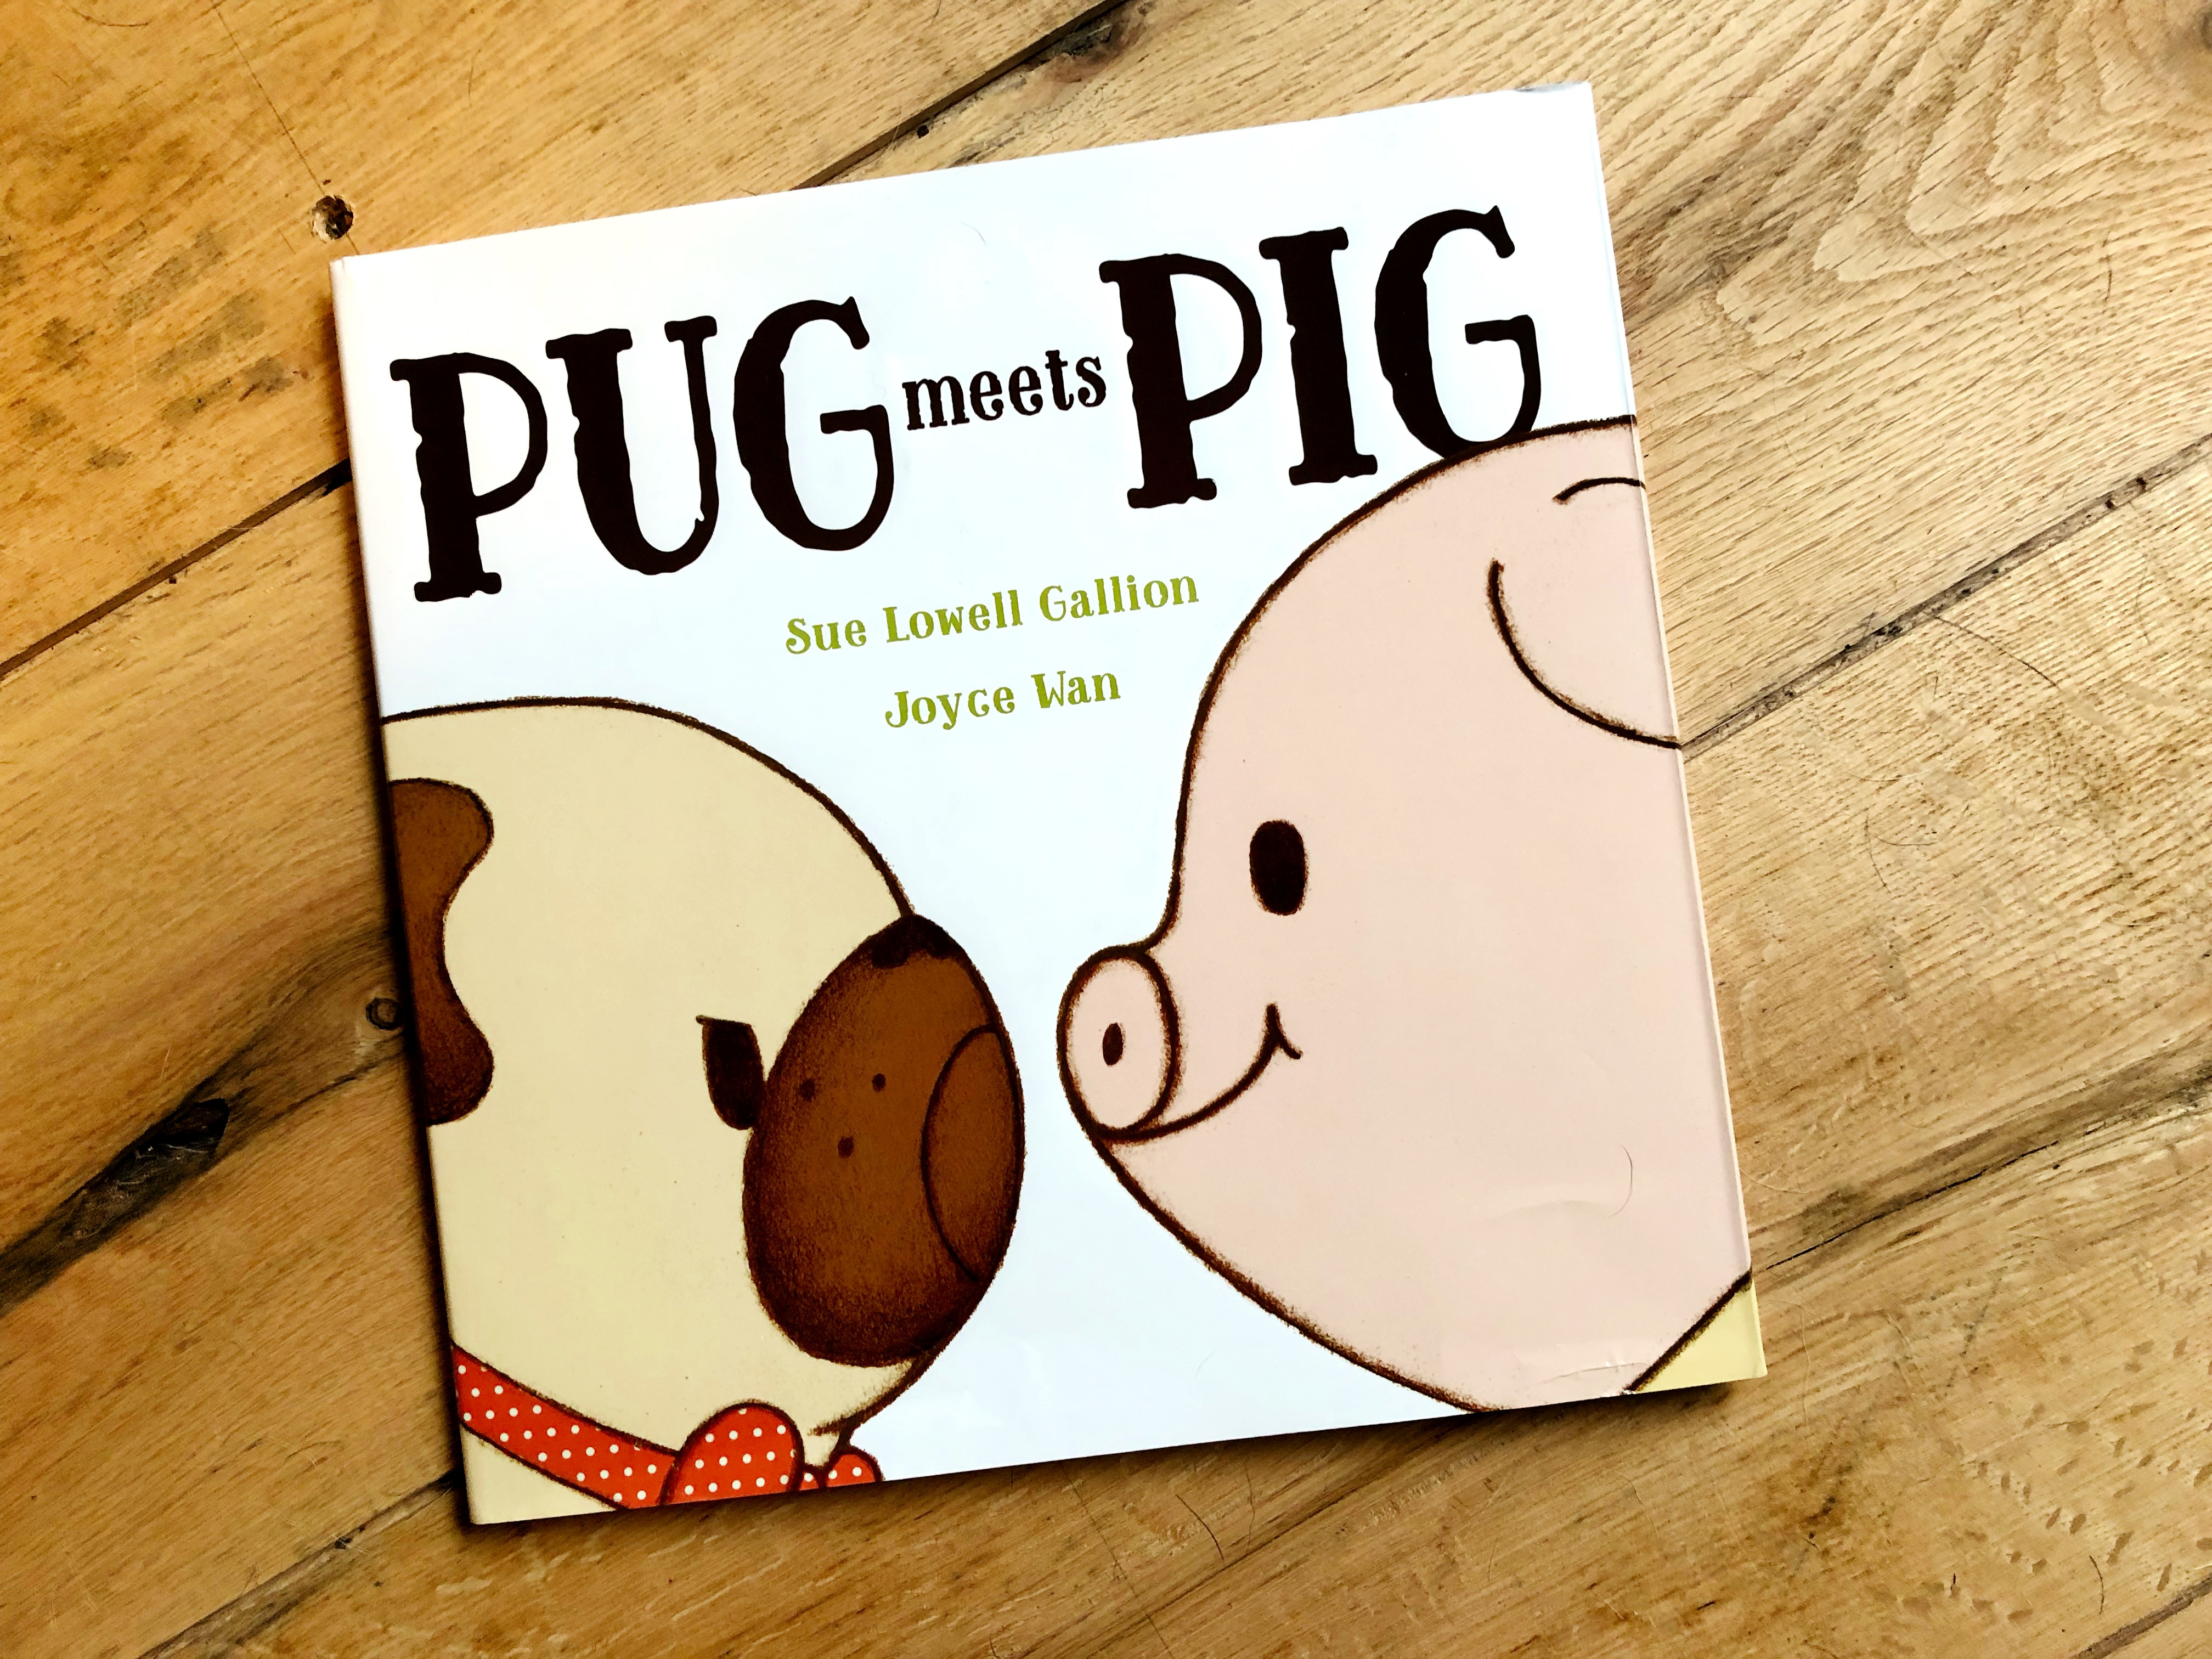 Gallion, Sue Lowell - Pug Meets Pig (1)